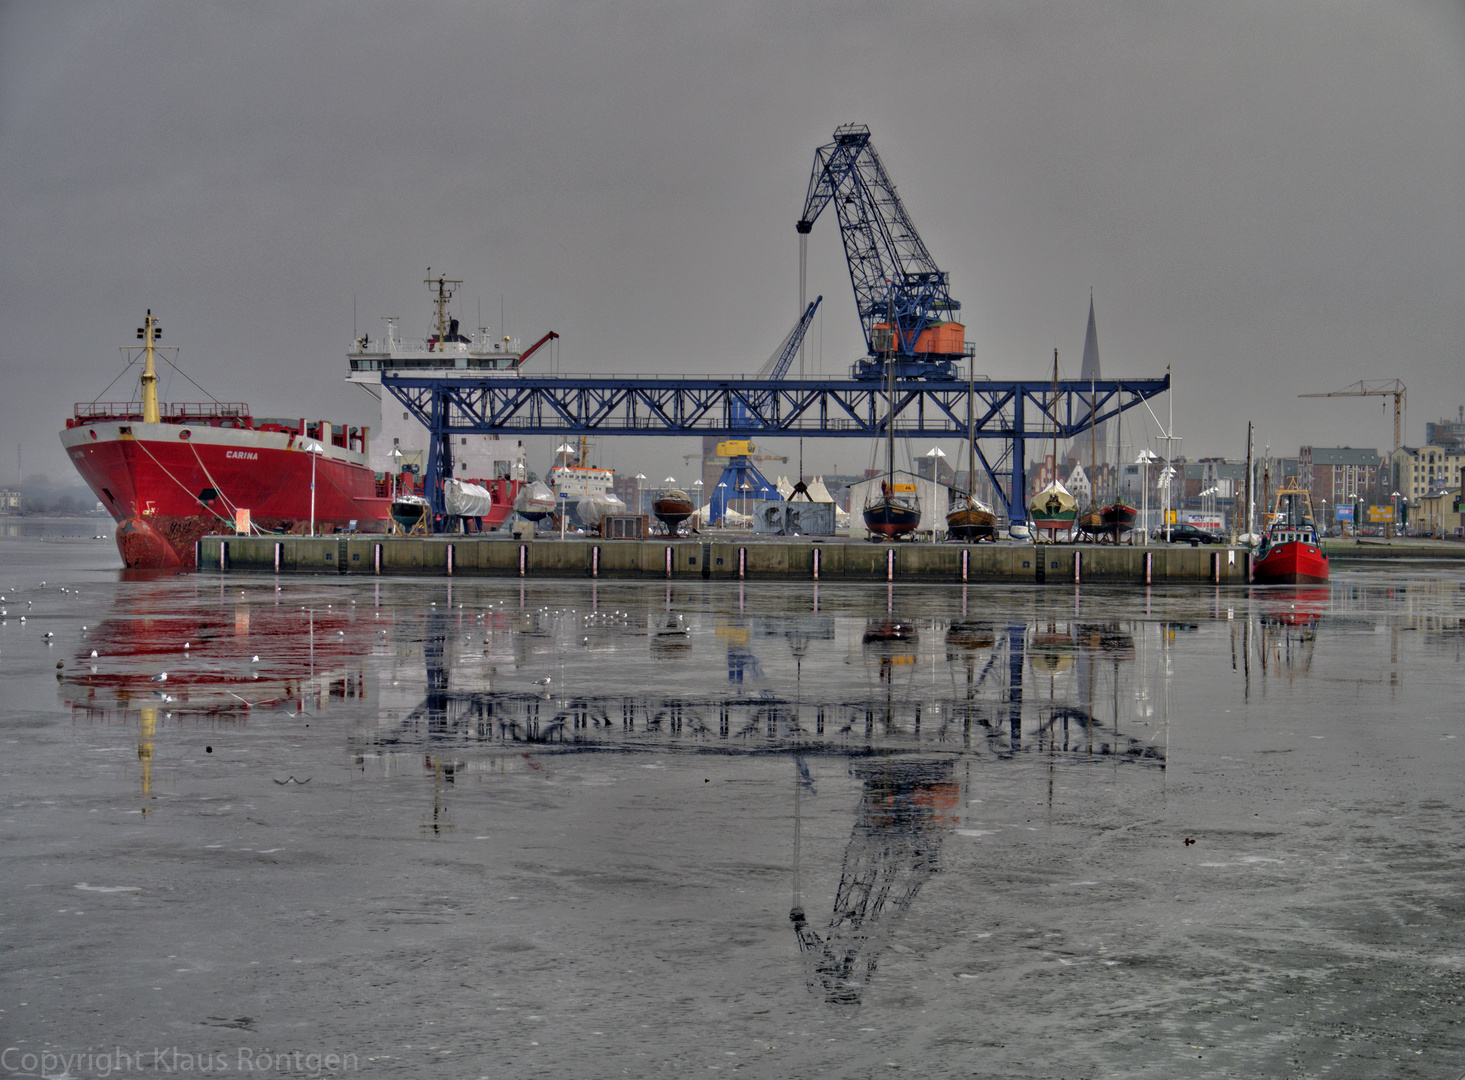 Stadthafen Rostock (HDR)